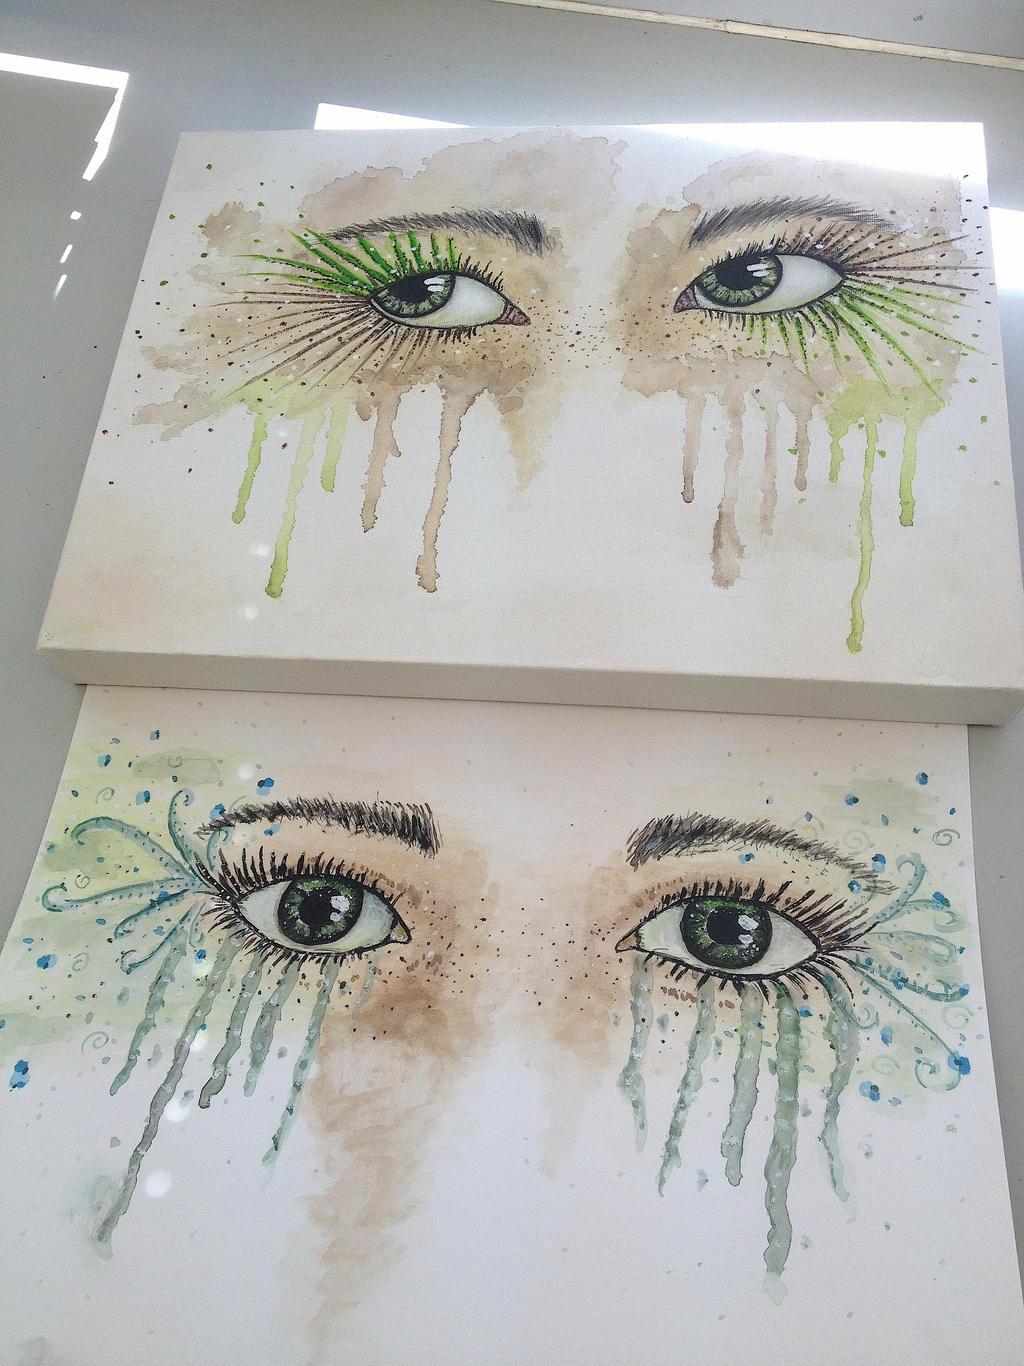 GCSE Art Coursework, any ideas?